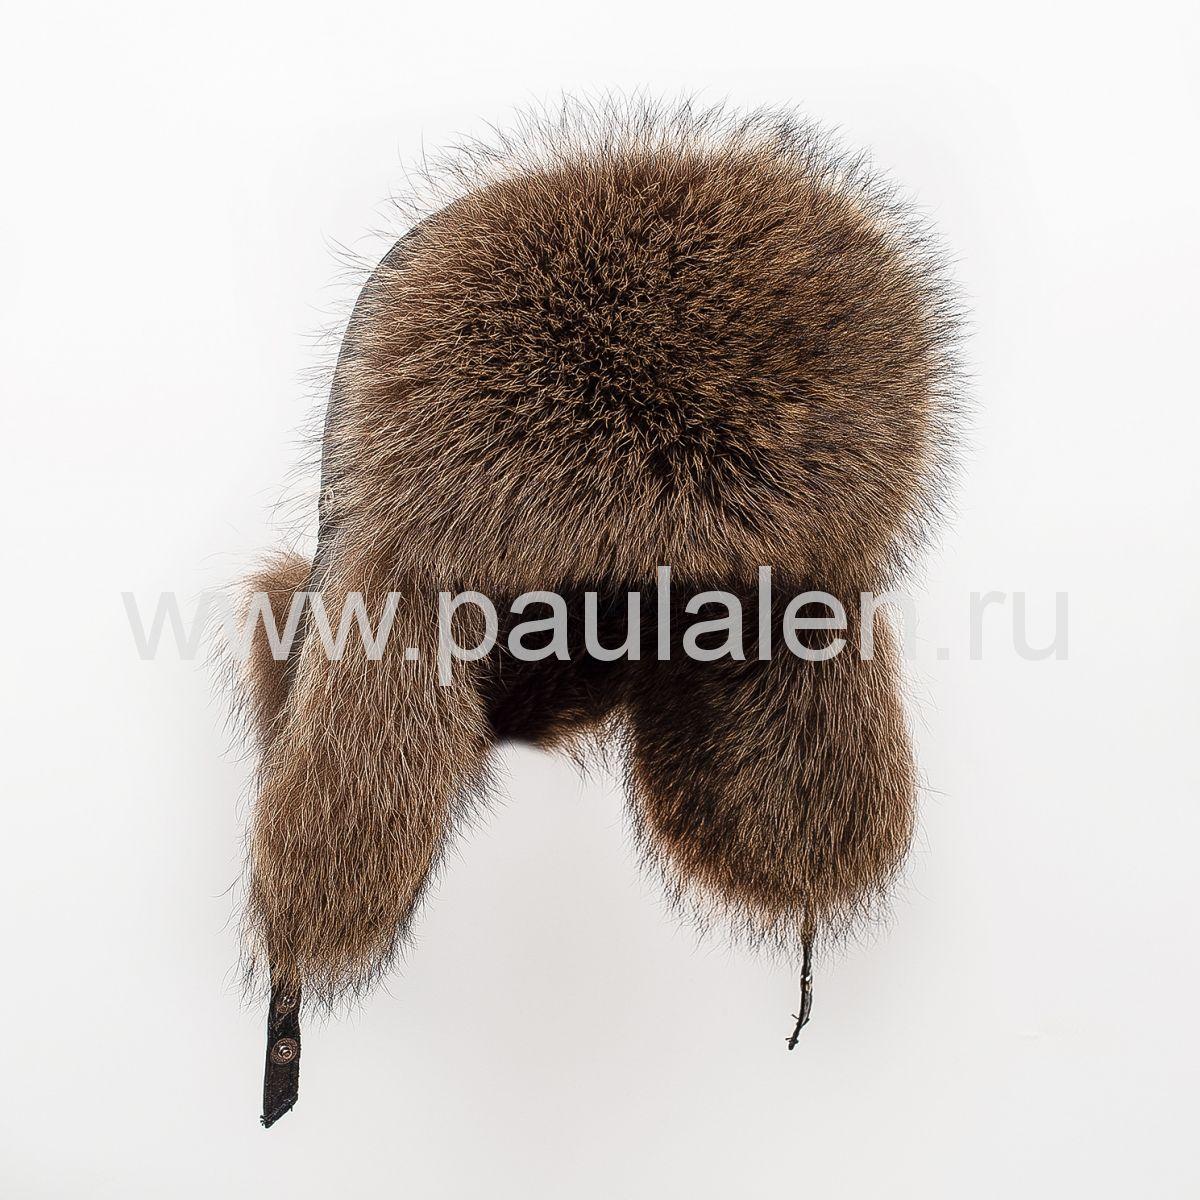 Мужская шапка ушанка (Пилот) из меха енота полоскуна (Архив)